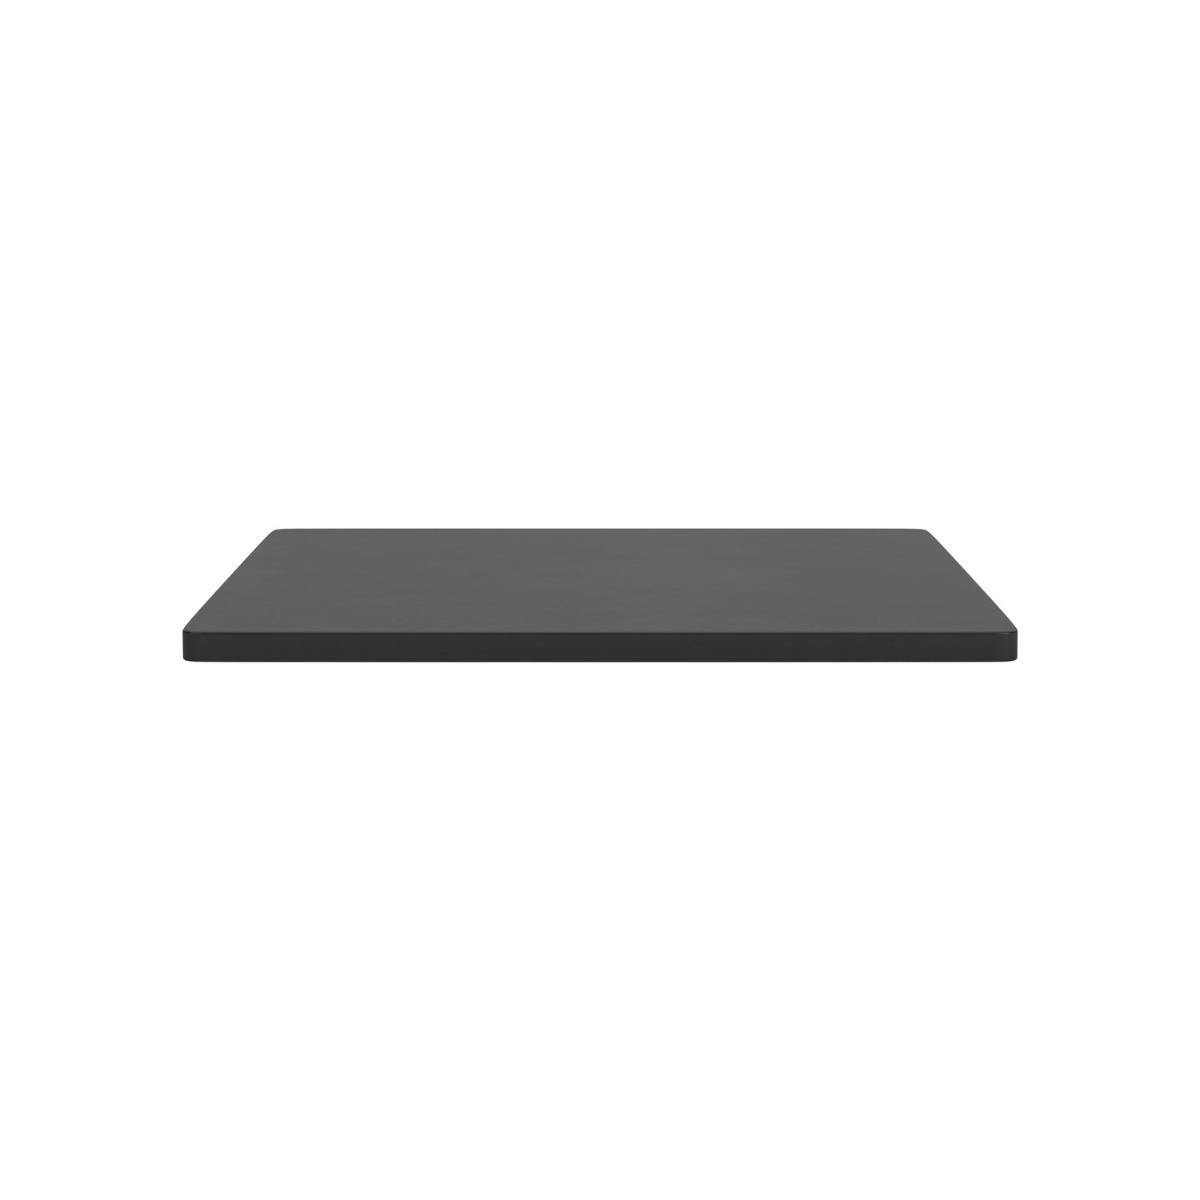 Montana Toppskiva Wire 34,8x34,8cm Black